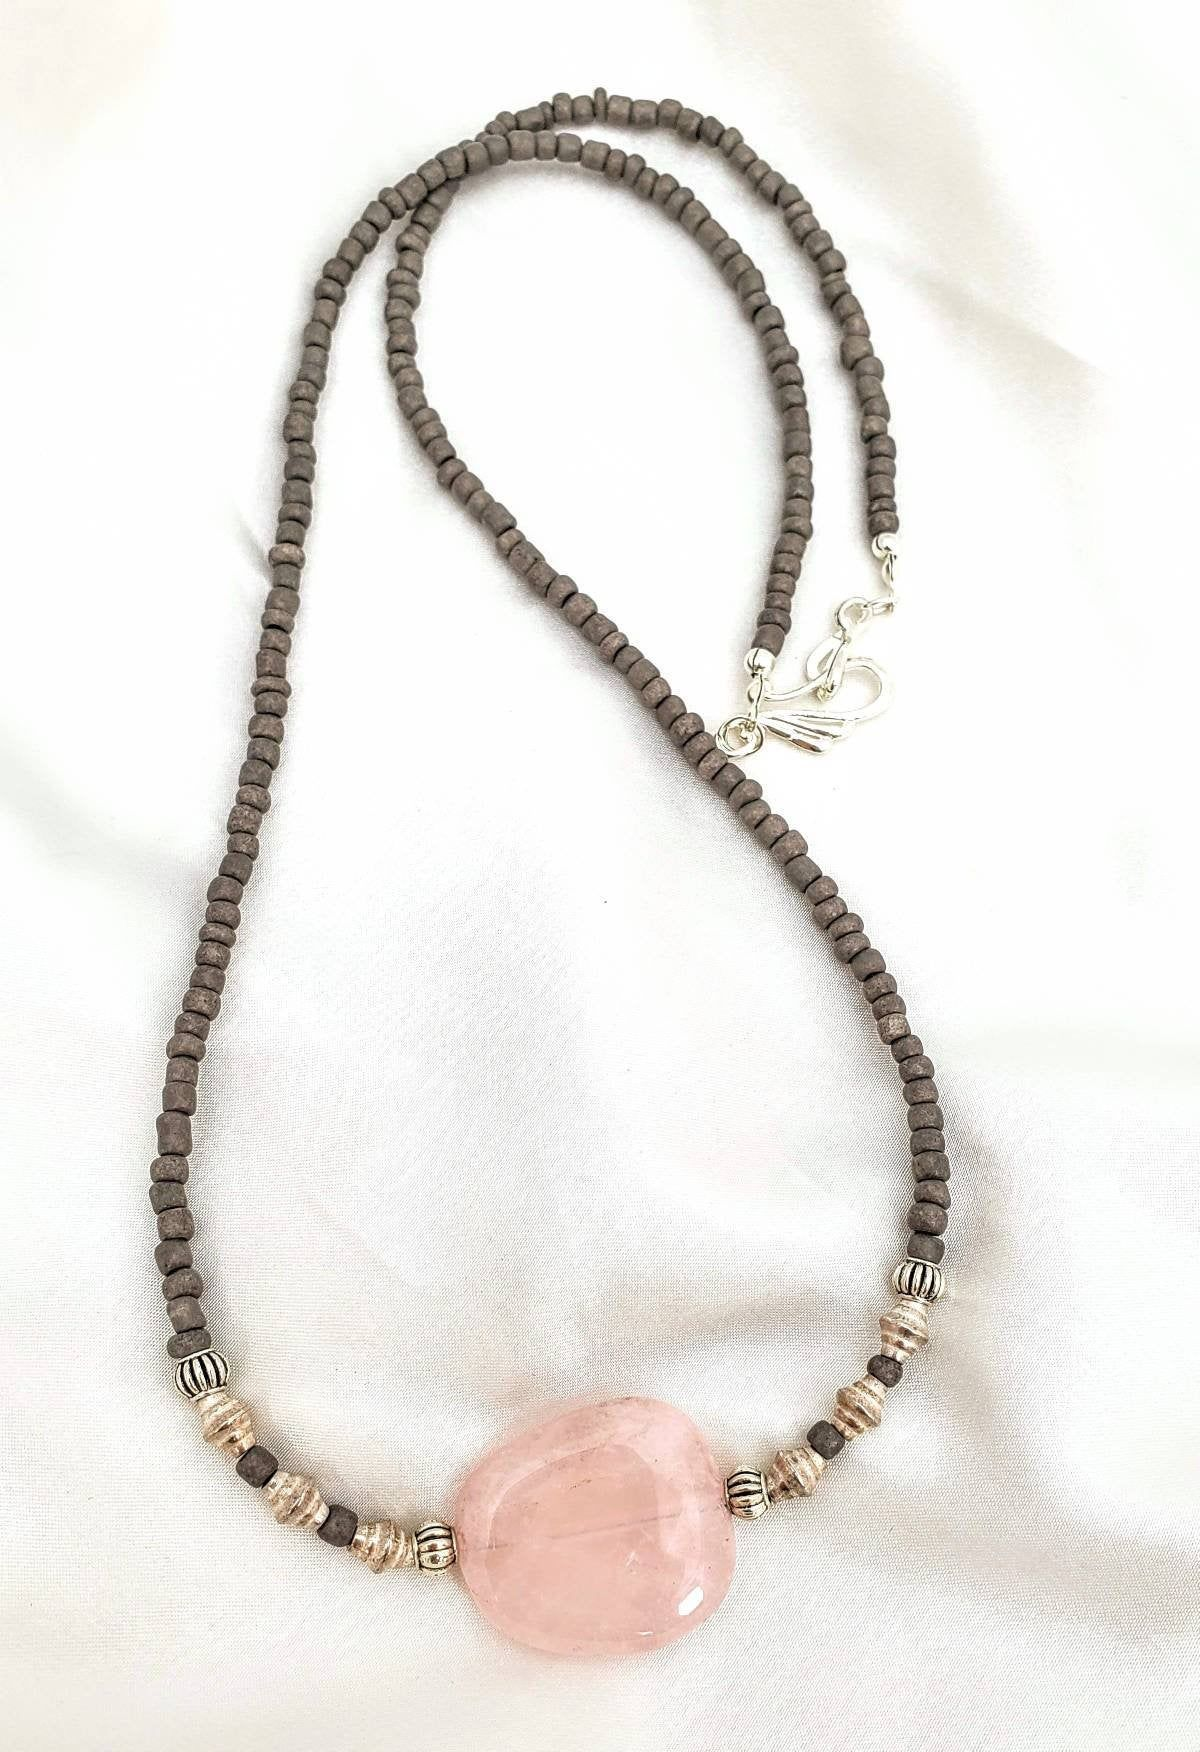 Minimalist boho rose quartz necklace. Irregular pebble gemstone. Ultra long, layering jewelry. Pink & gray, textured silver accents.